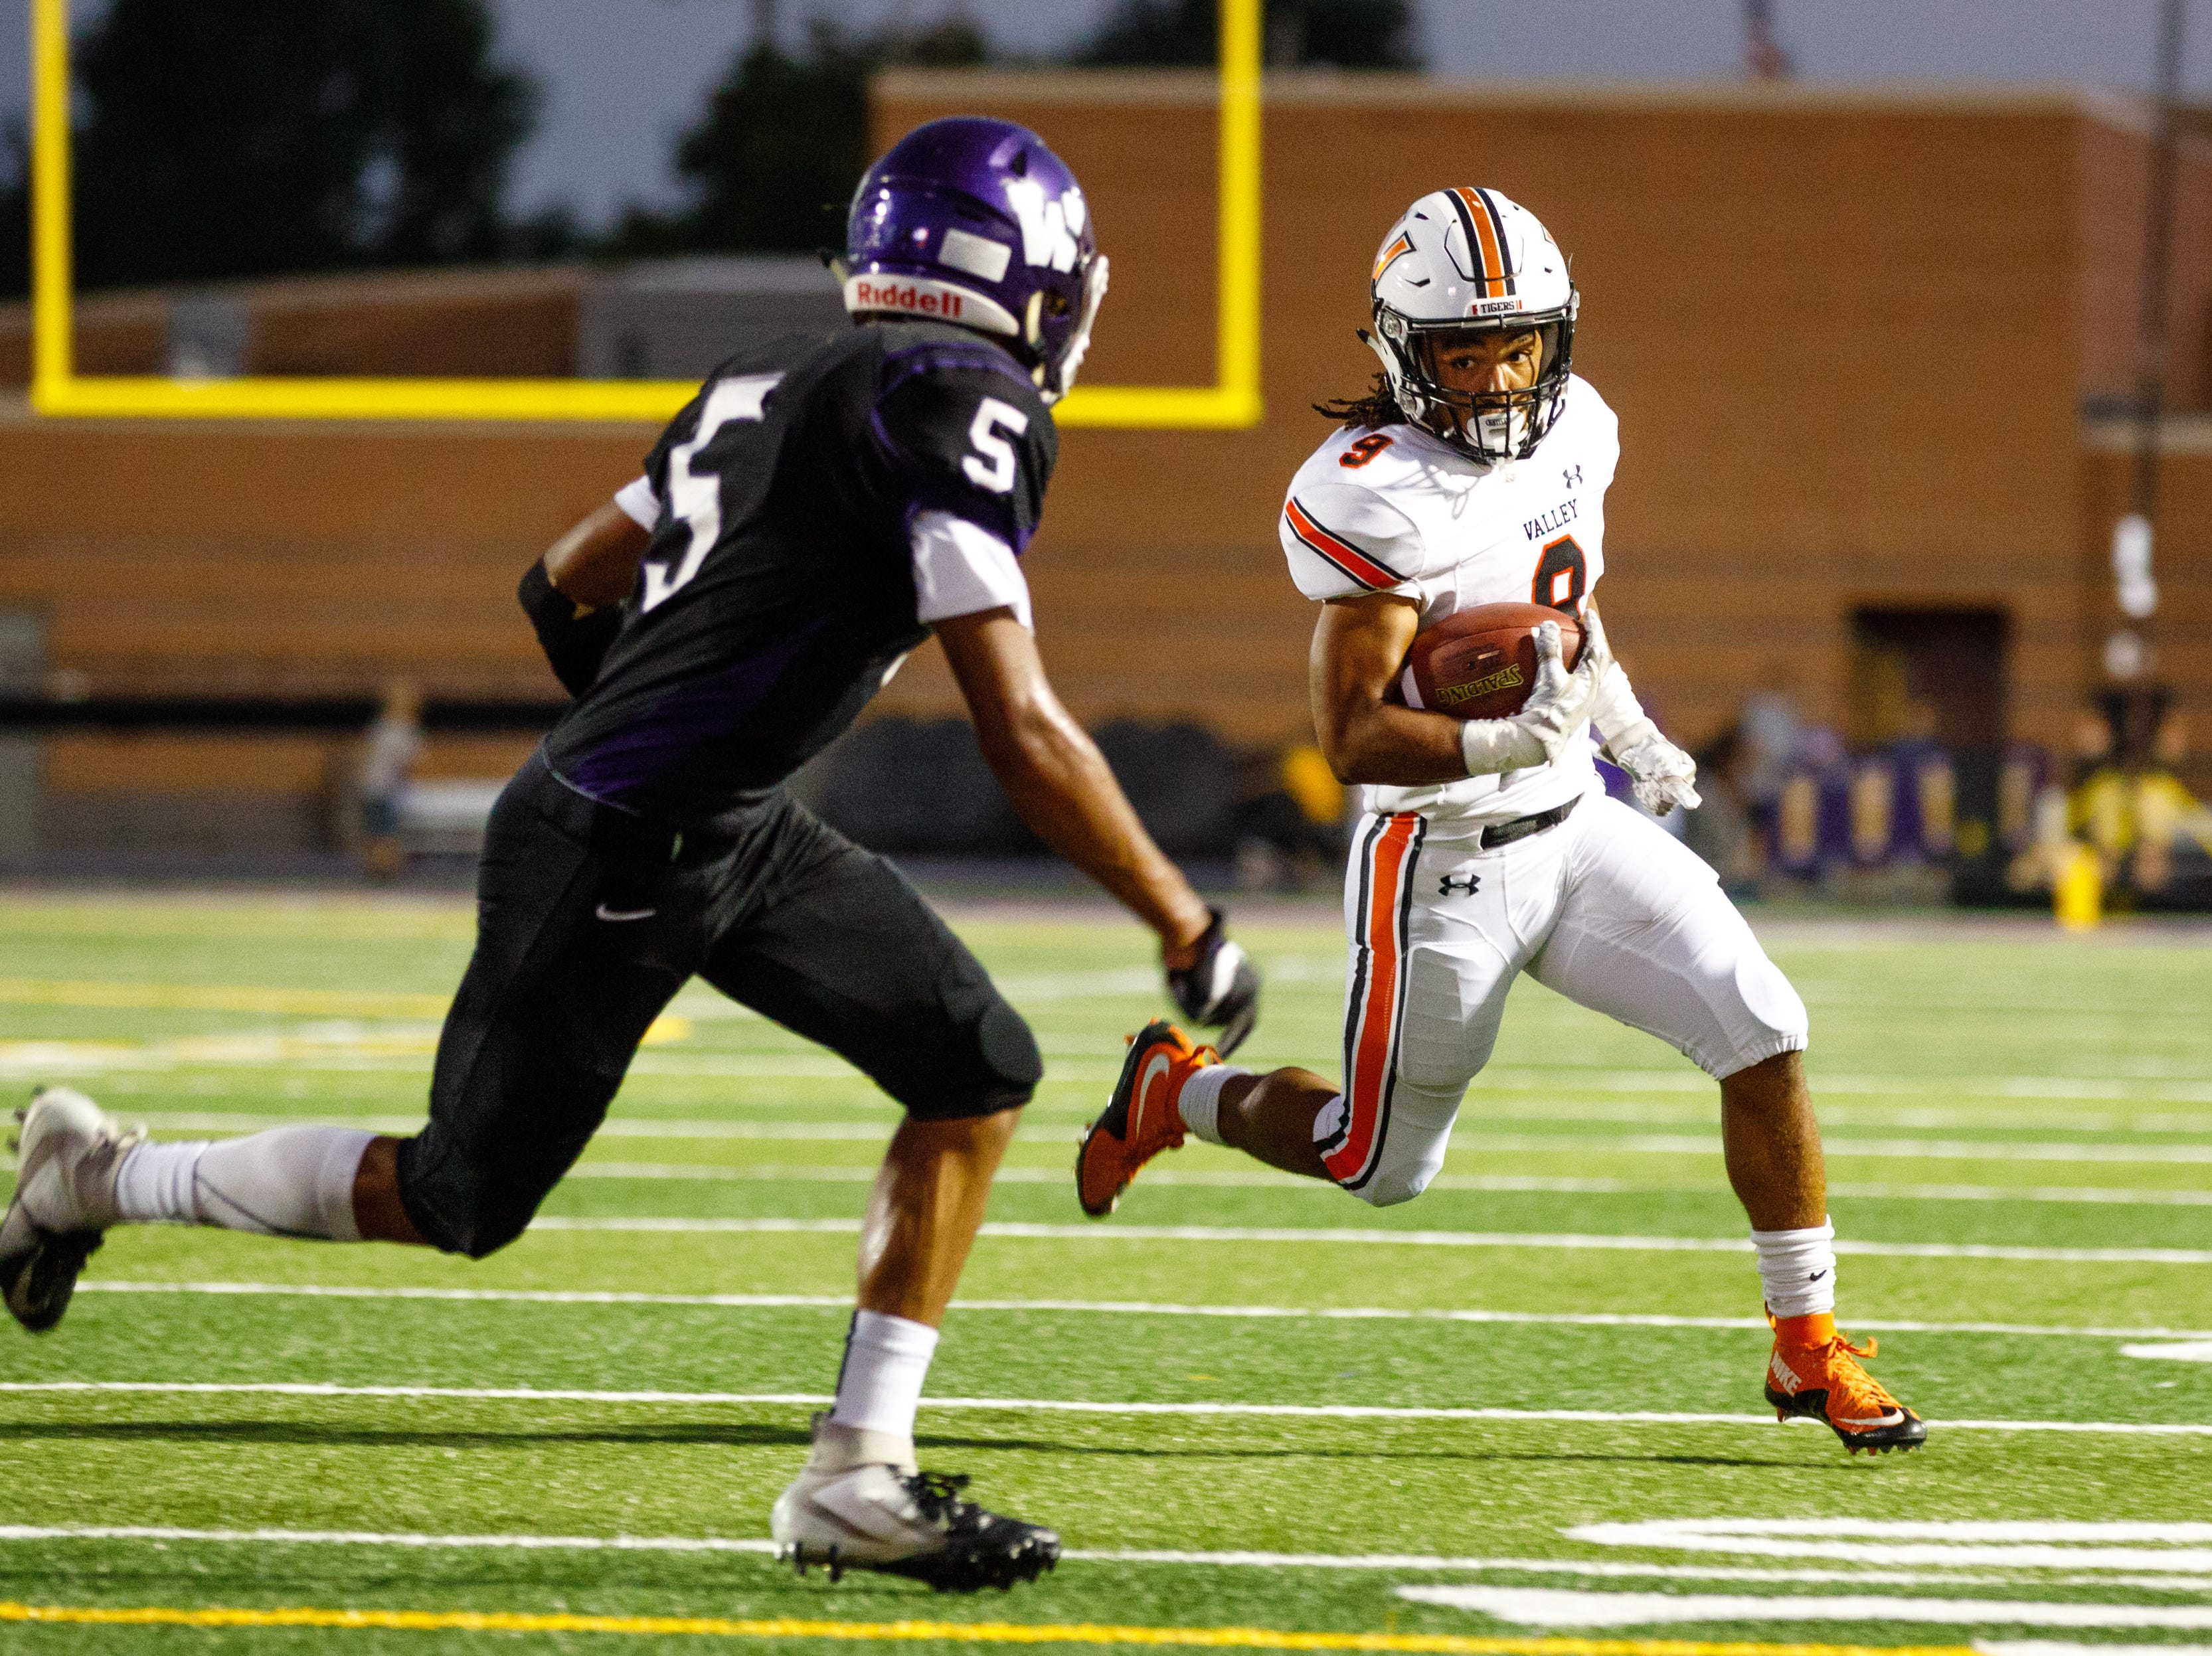 Valley High School's Creighton Mitchell (9) tries to run around Waukee's Aaron Smith (5) in the second quarter Friday, Sept. 14, 2018, at Waukee Stadium.